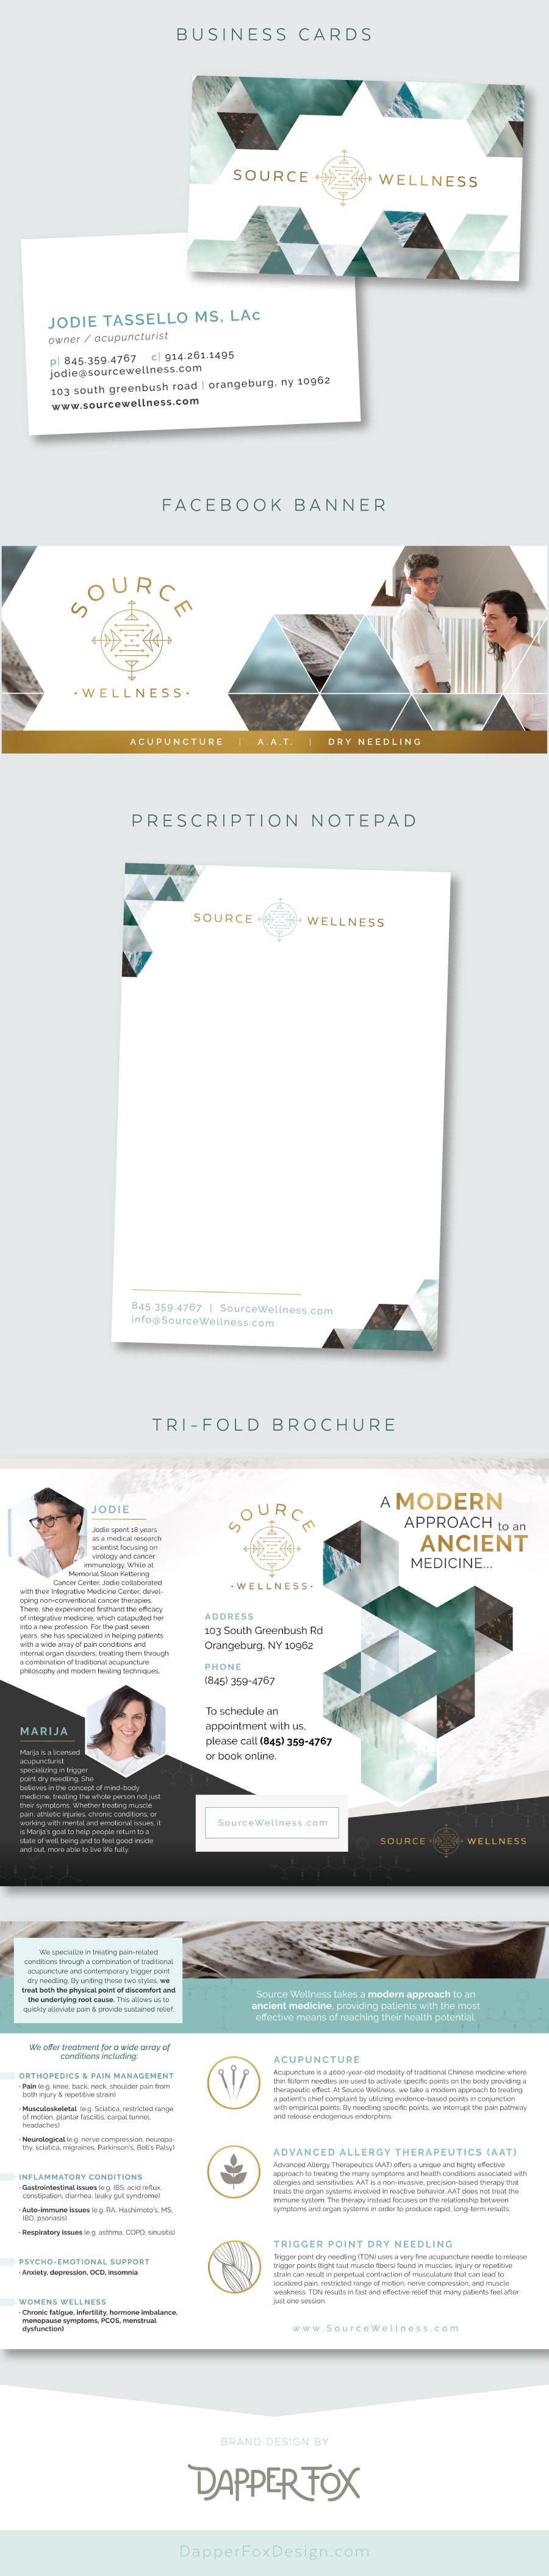 Source Wellness Business Card Design - Brochure Design - Social Media Graphics - Marketing Materials for Brand